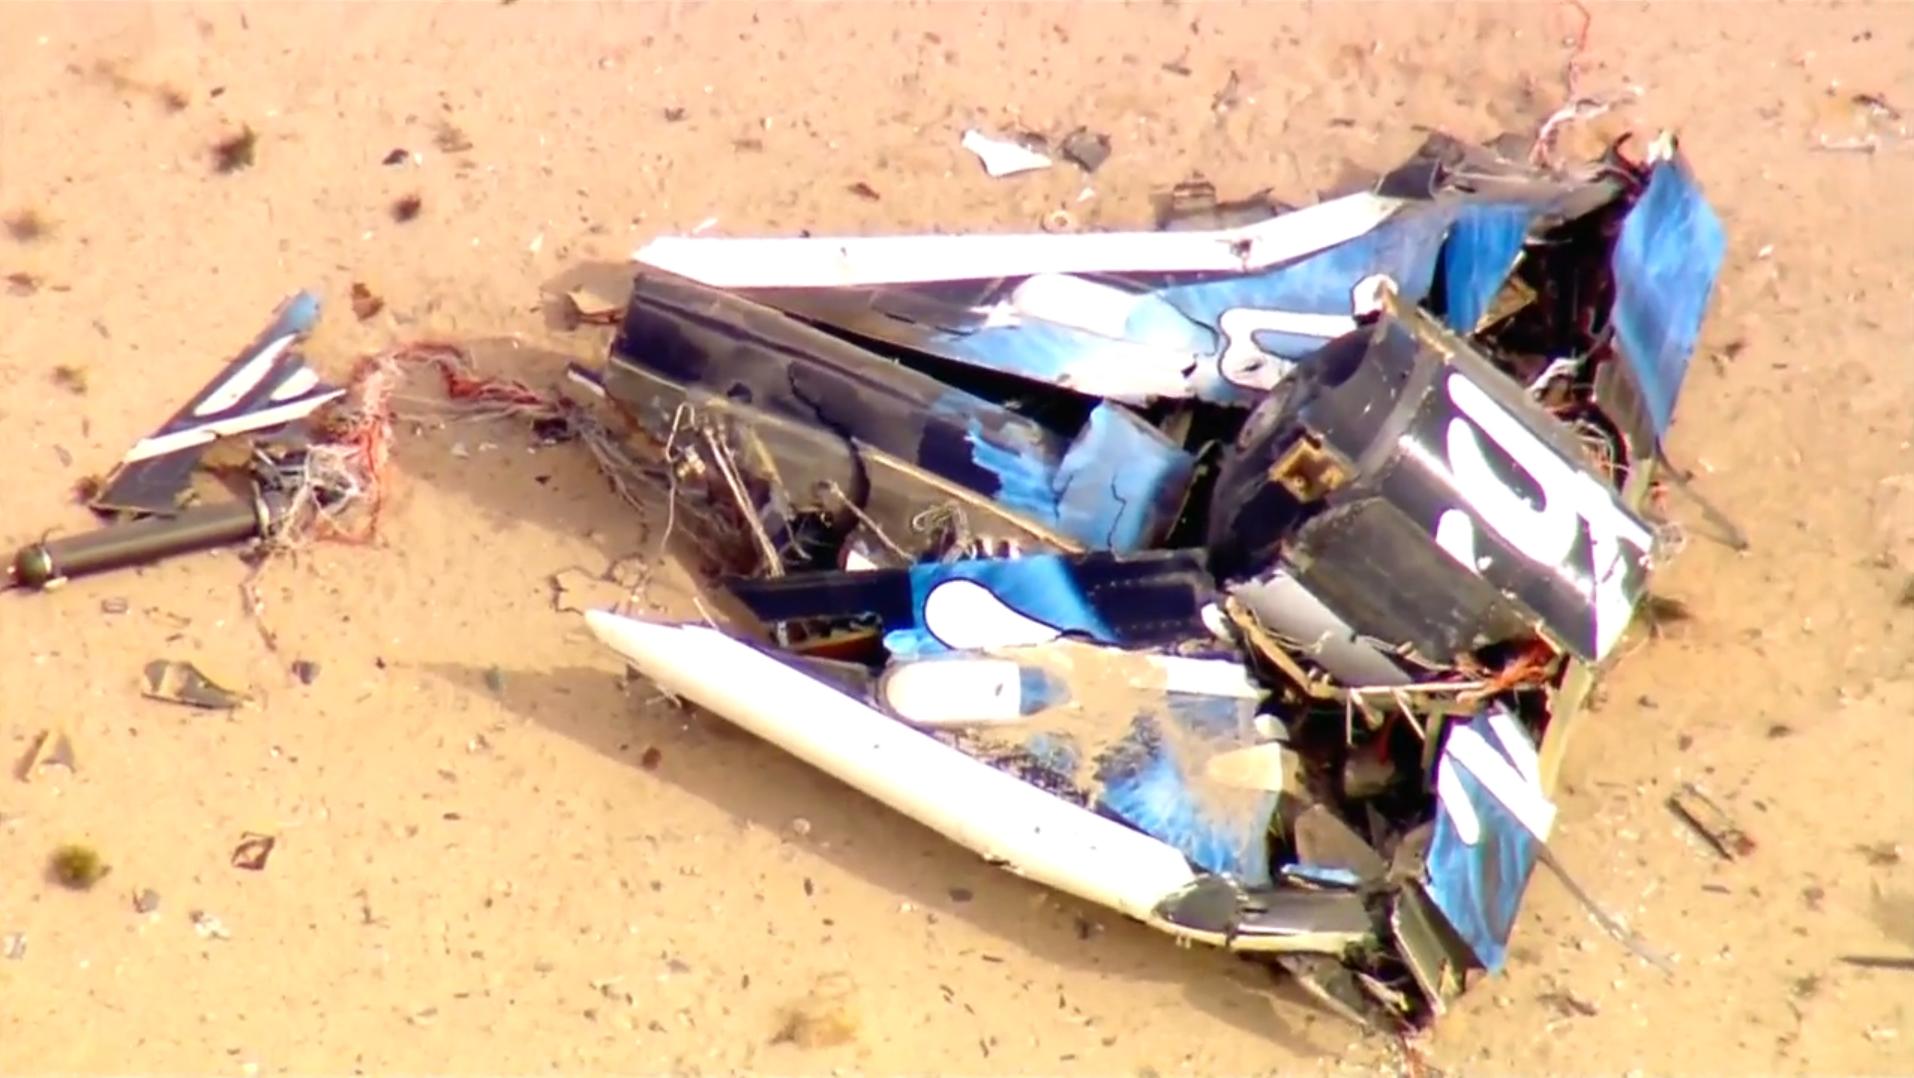 Virgin Galactic spaceship crashes in California - CBS News